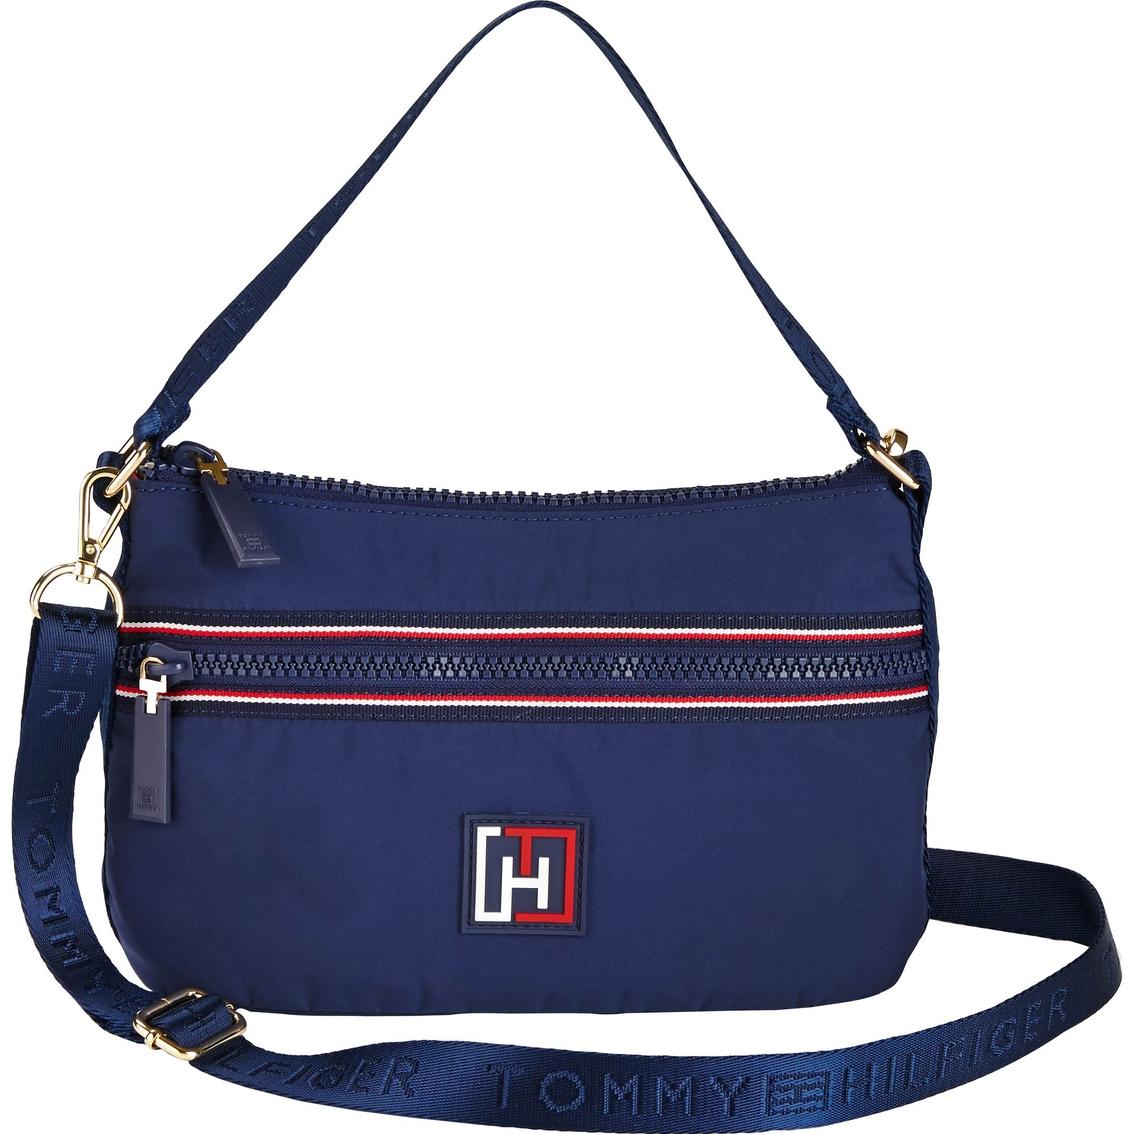 tommy hilfiger training mini convertible hobo hobo bags handbags accessories shop the. Black Bedroom Furniture Sets. Home Design Ideas